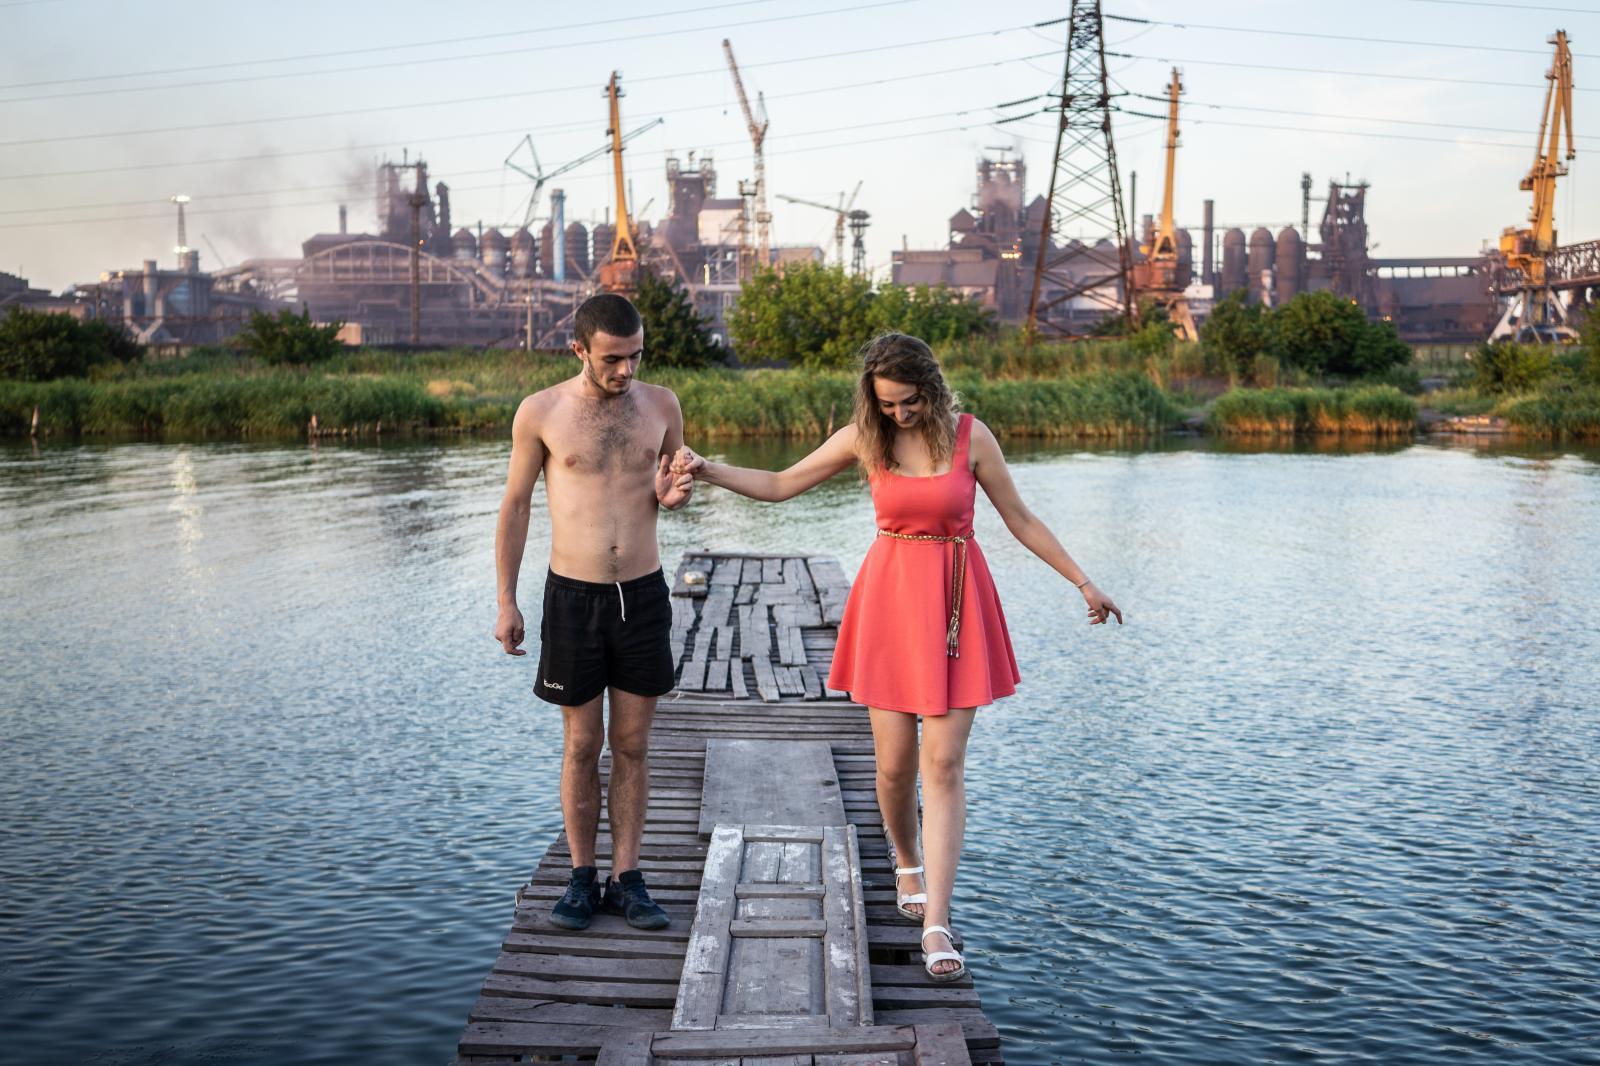 Photography image - Loading SK_Mariupol_02.jpg